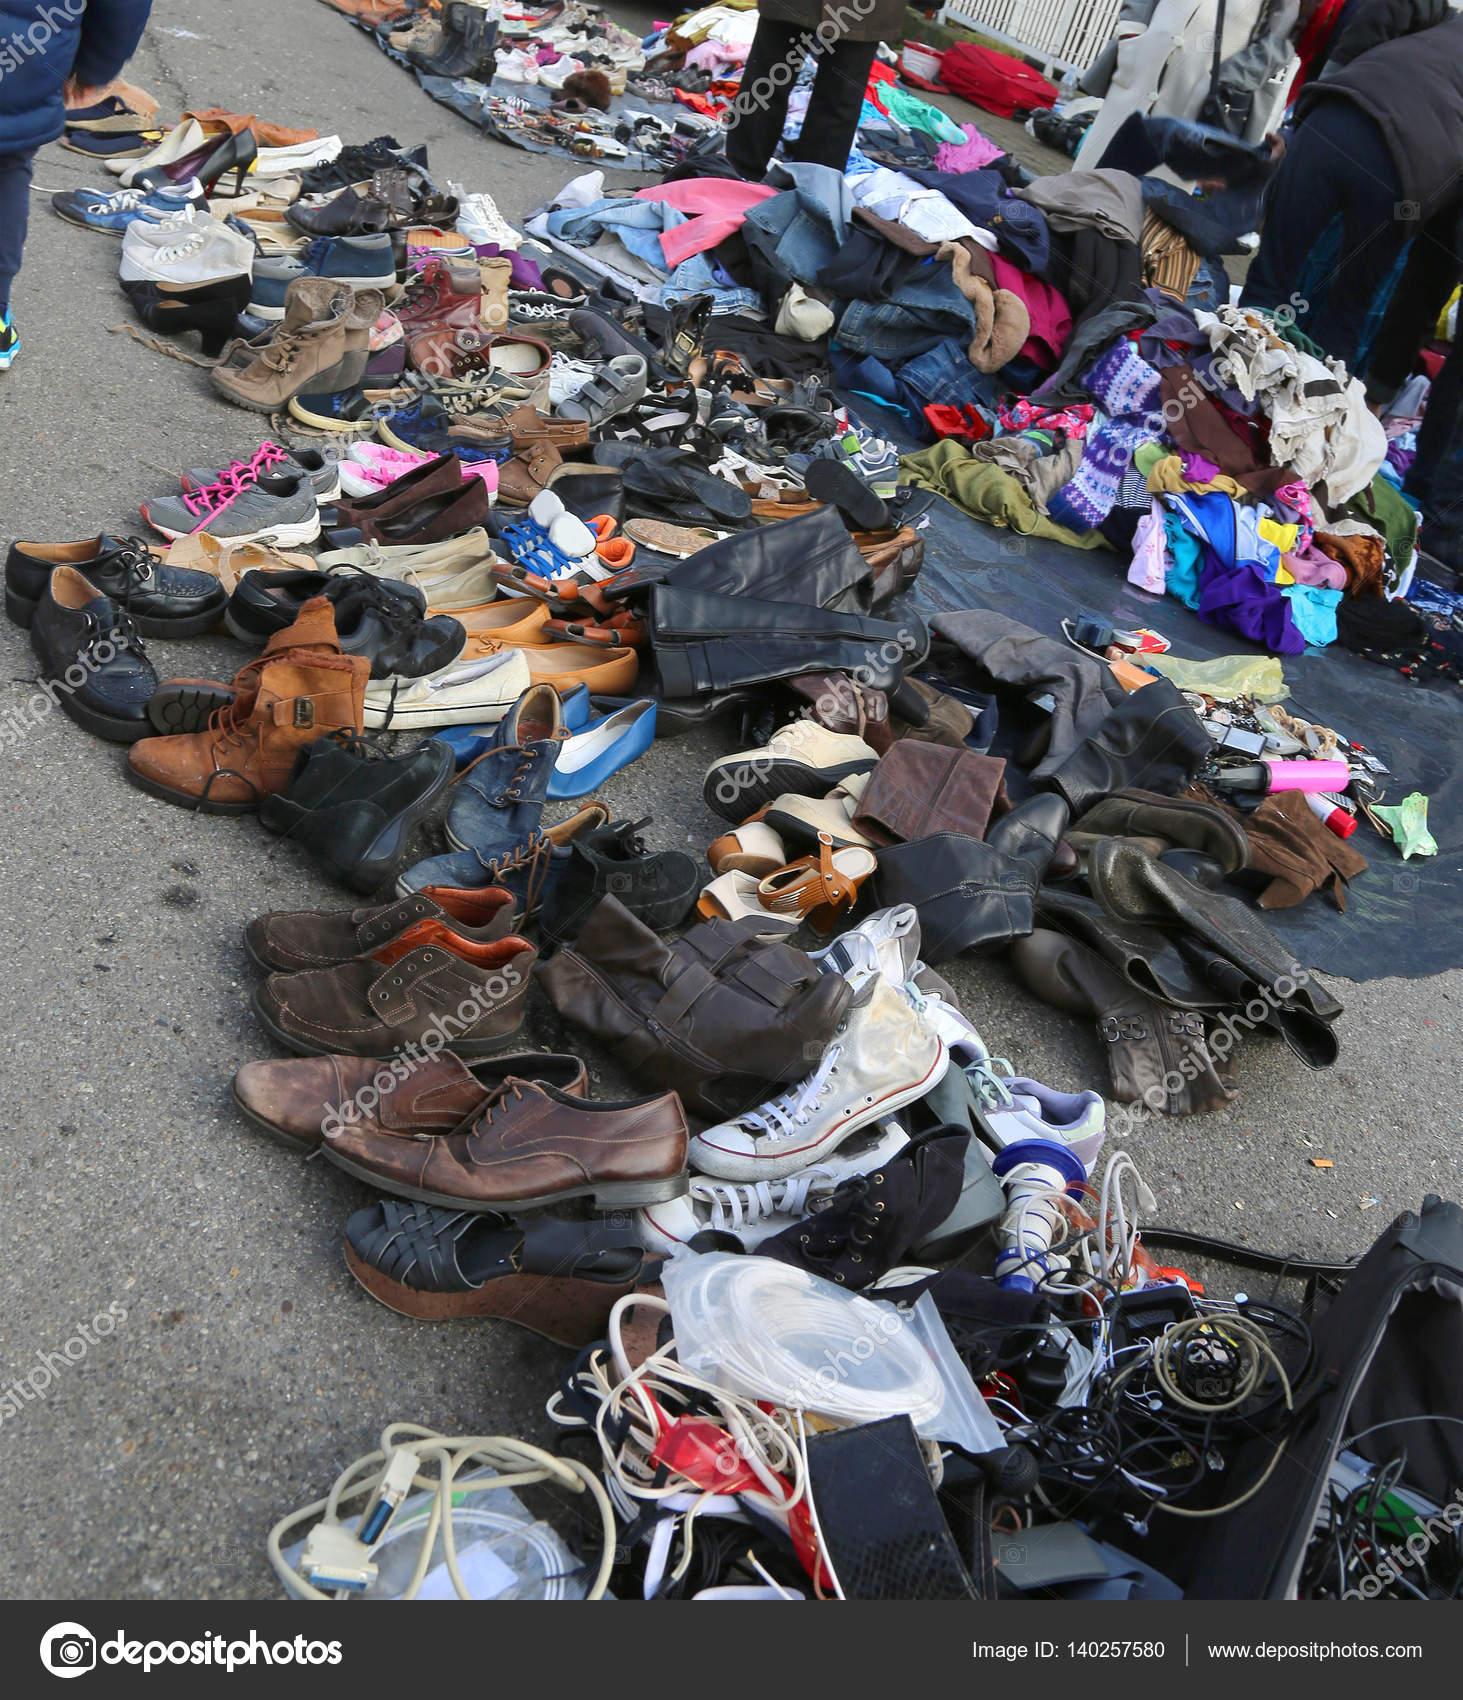 13992c78ad09 Μεταχειρισμένα ρούχα και άθλια ρούχα σε μια υπαίθρια λαϊκή αγορά —  Φωτογραφία Αρχείου